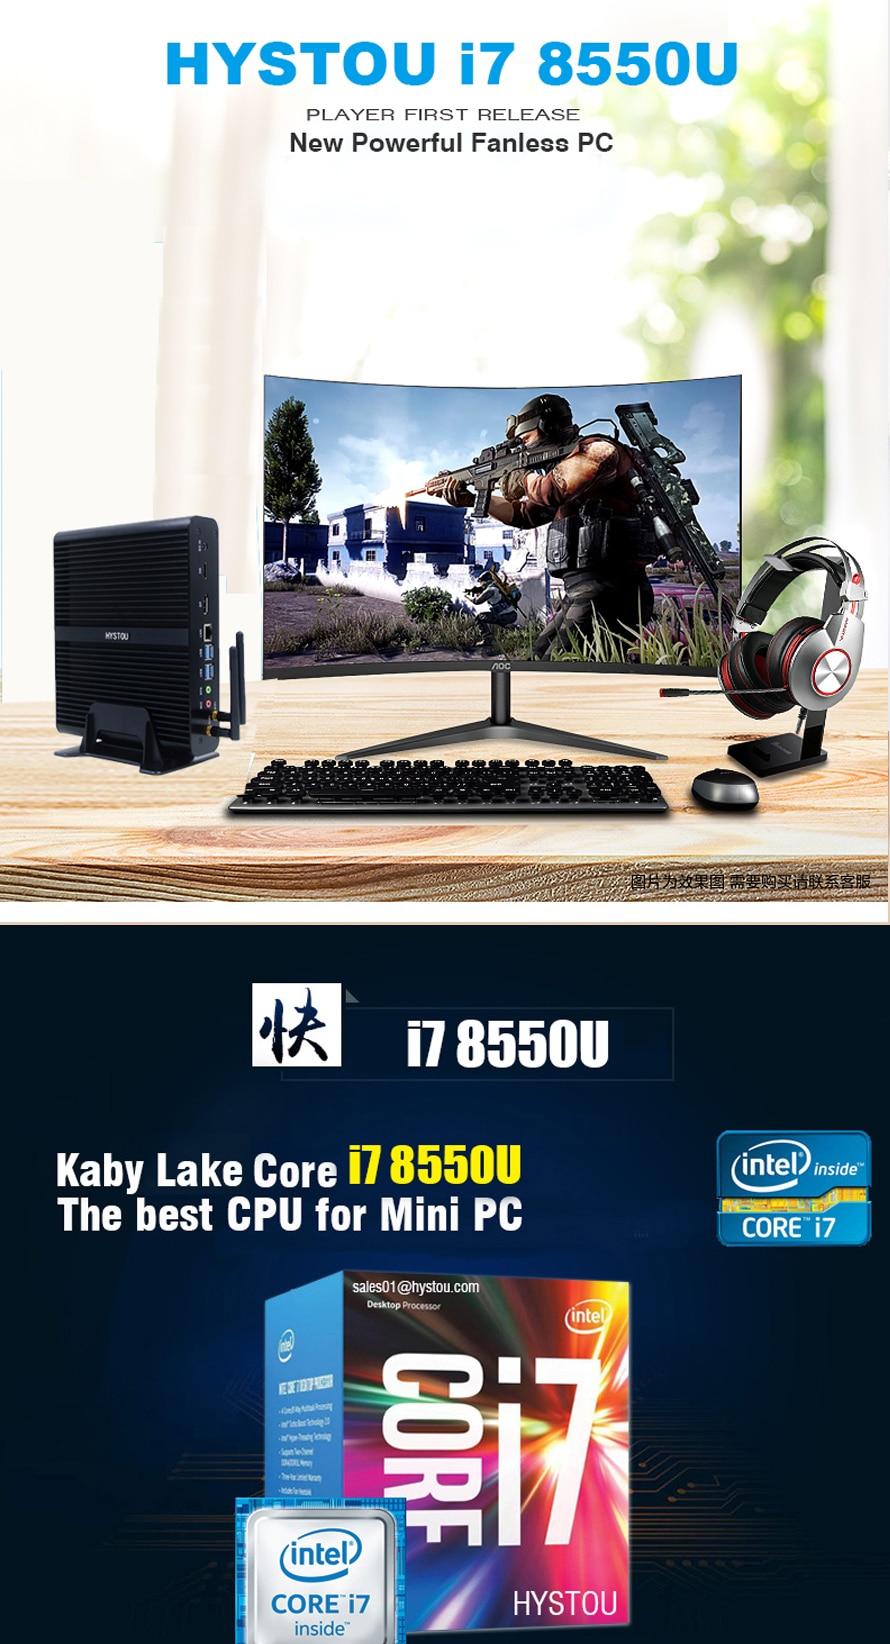 intel-core-i7-8550u-ddr4-RAM-16G-minipc-nuc-i7-windows10-wifi-with-bluetooth-2.7ghz-graphics620-usb-3